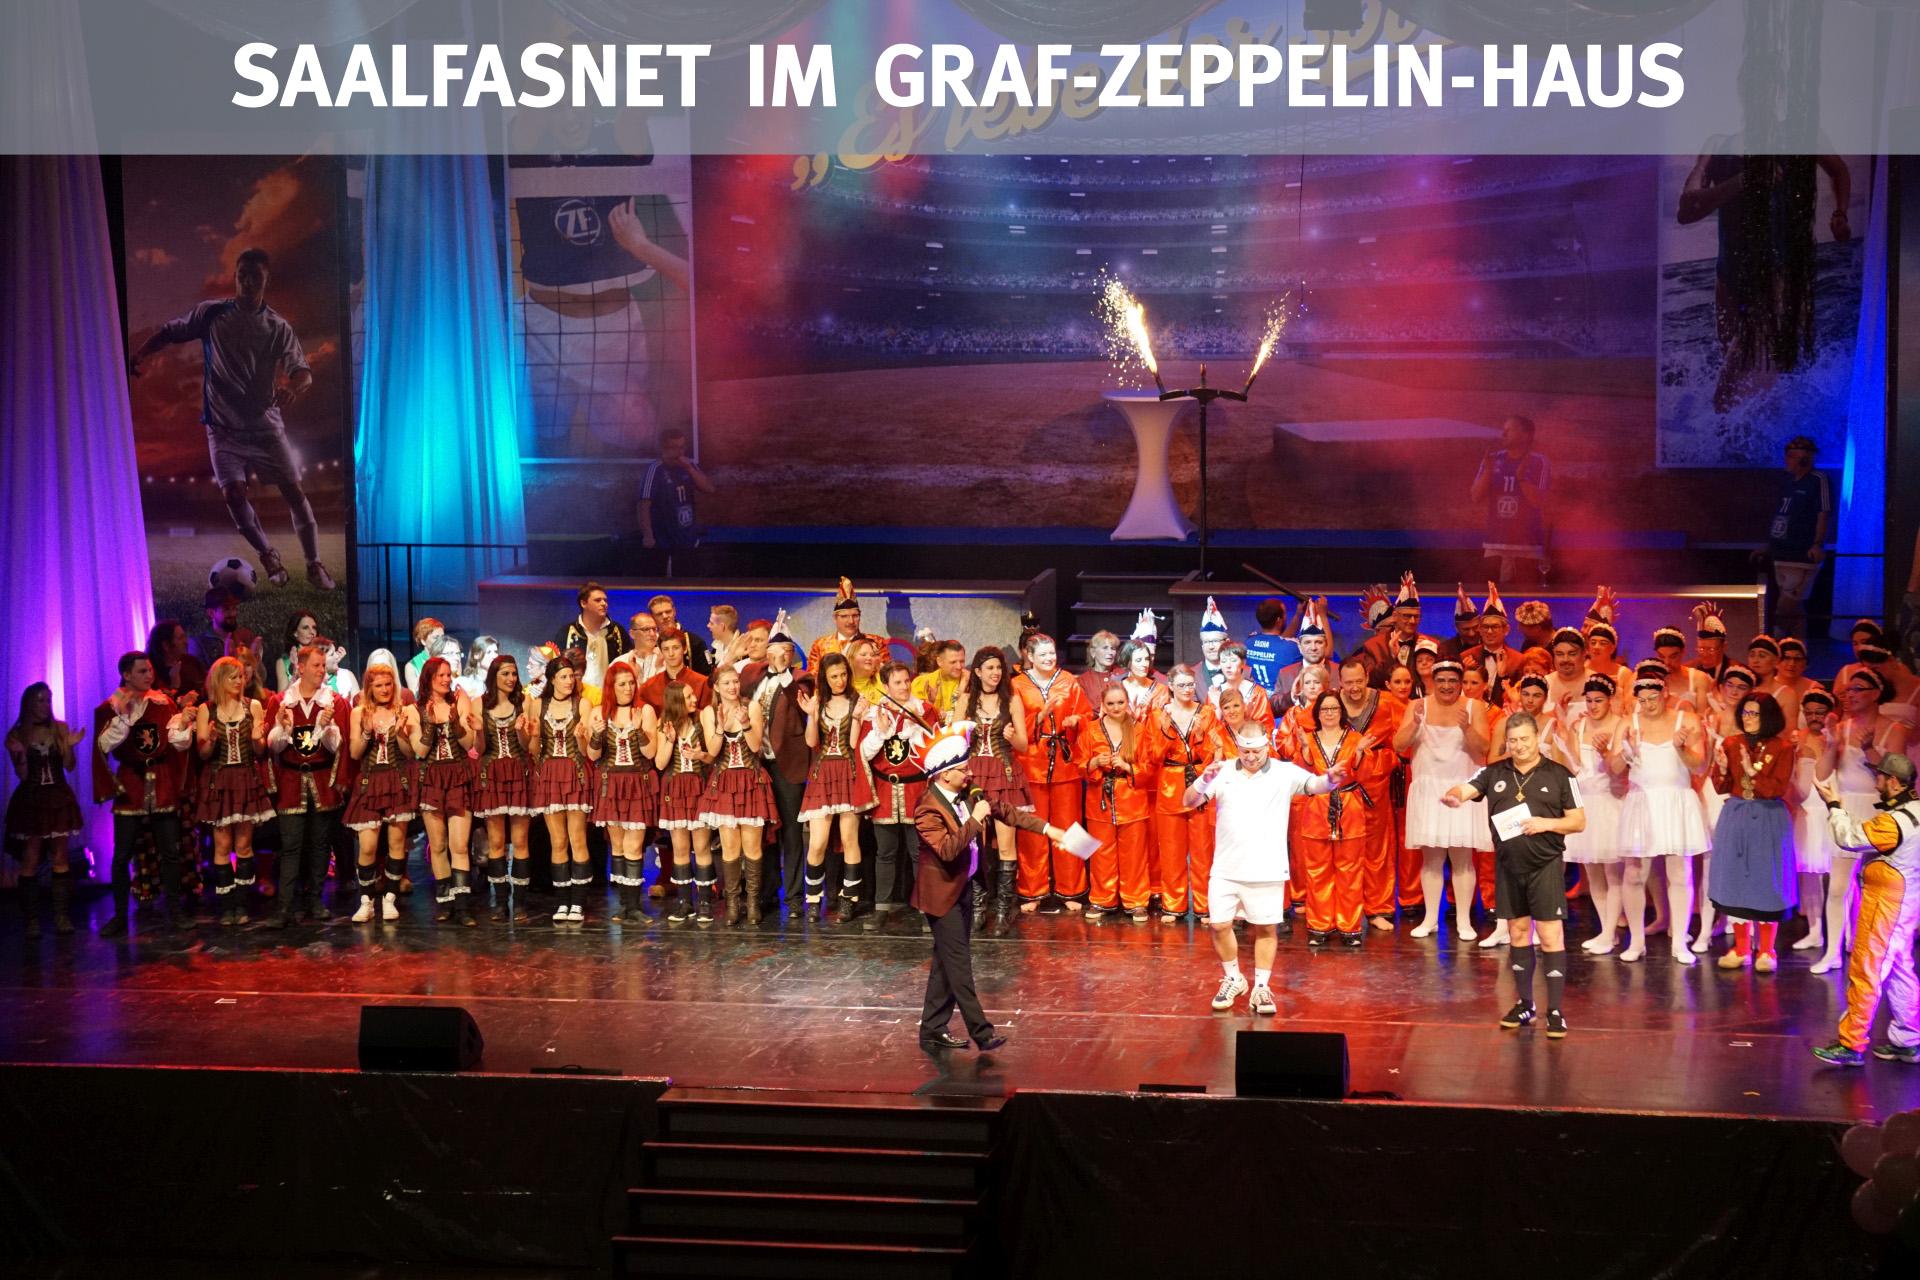 Saalfasnet im Graf-Zeppelin-Haus